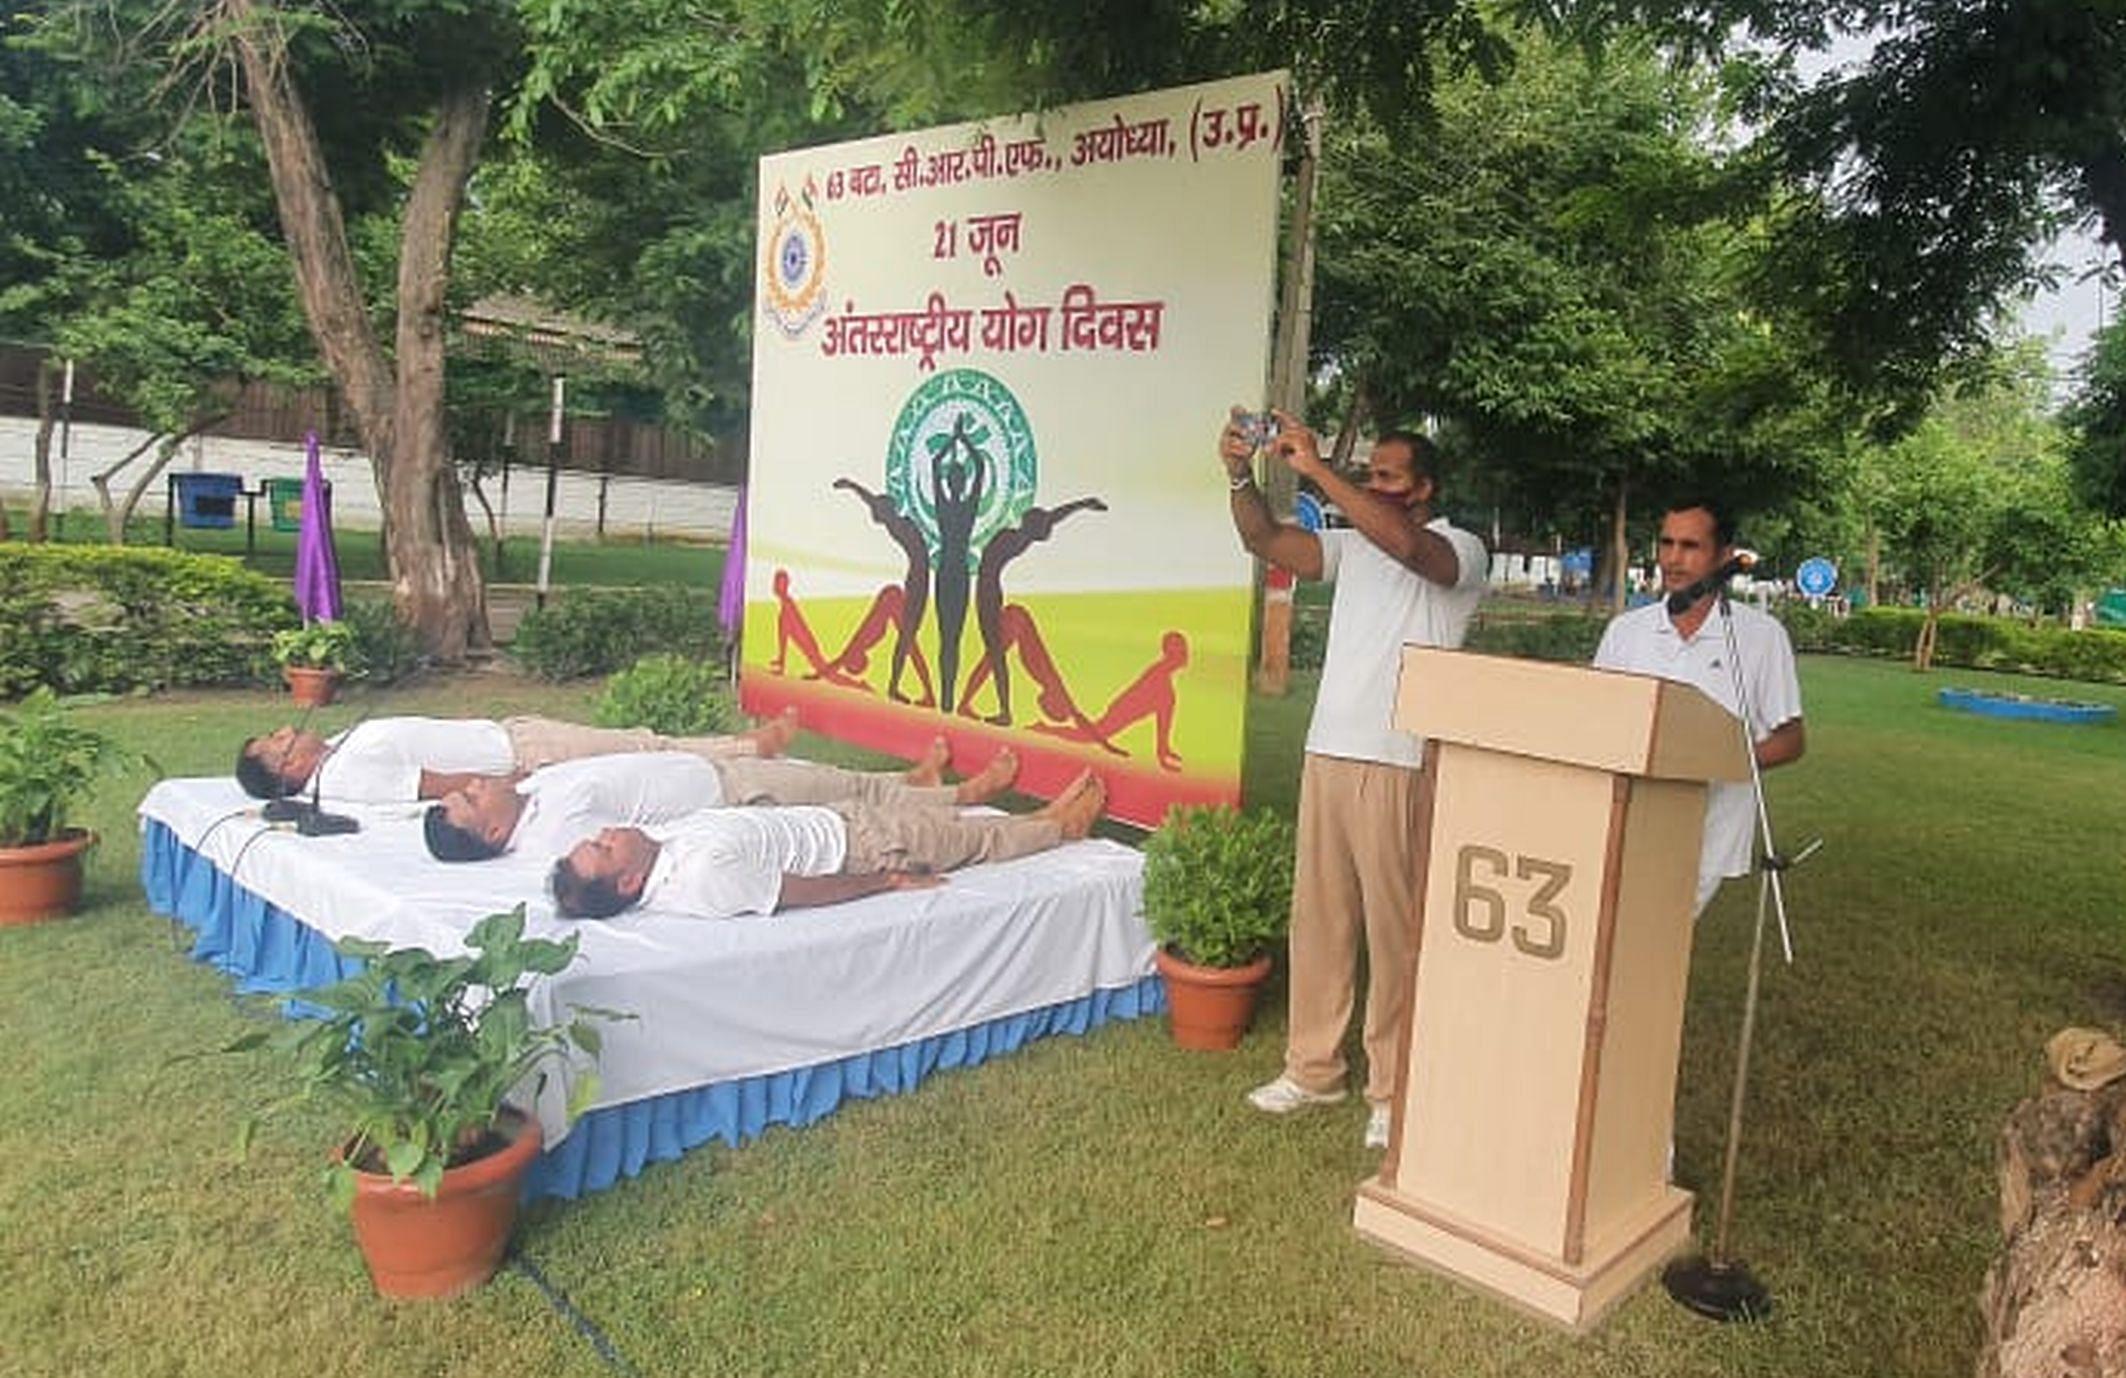 अयोध्या-योग दिवस पर योगाभ्यास करते 63 बटालियन केंद्रीय पुलिस बल के अधिकारी व अन्य